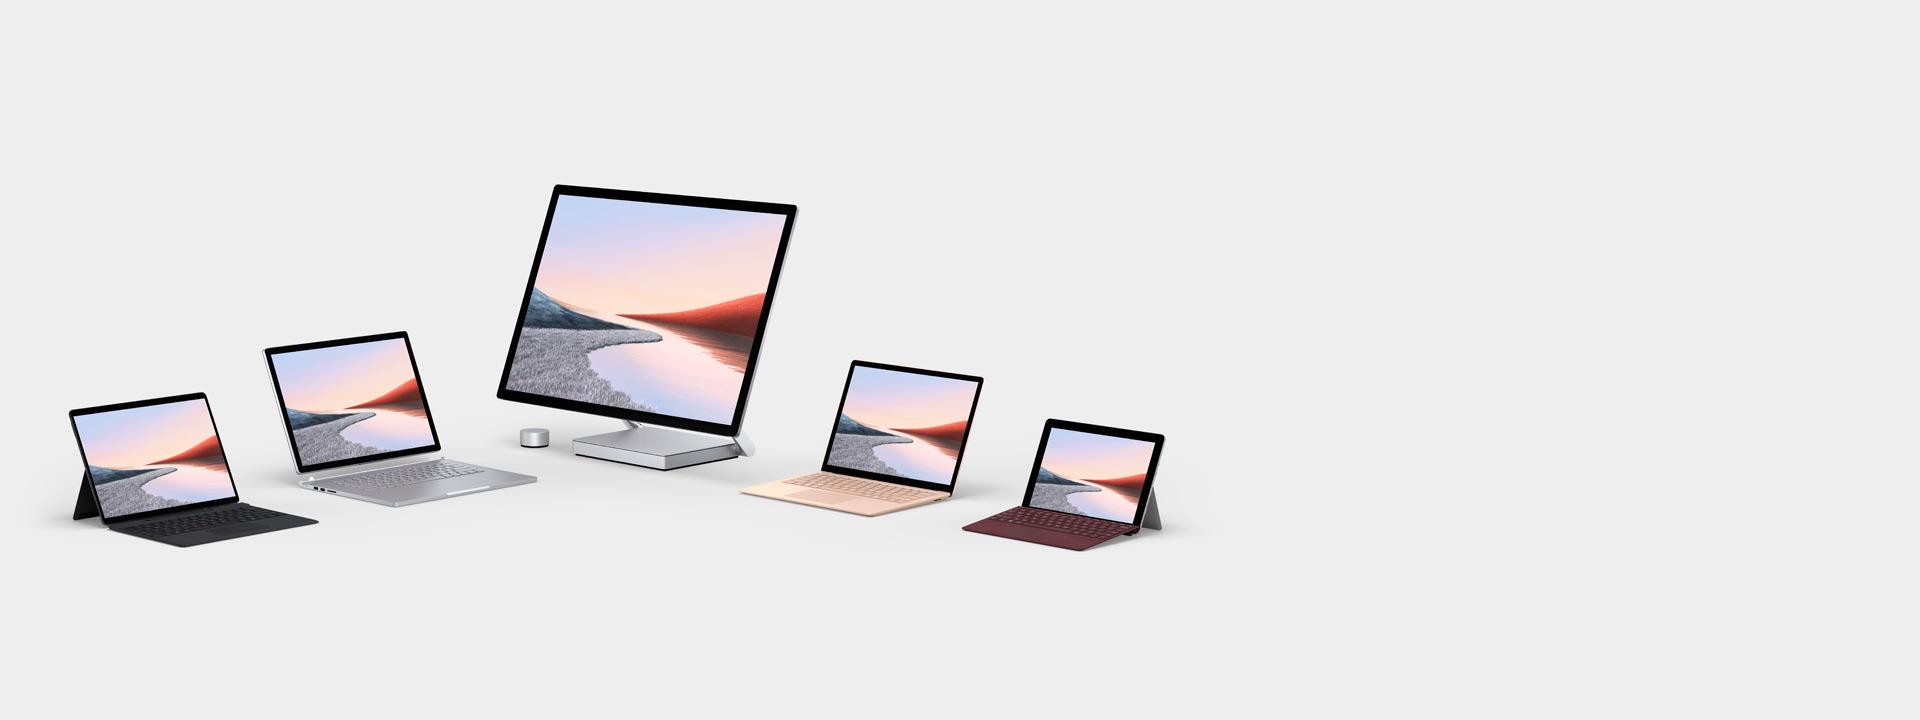 显示多台 Surface 电脑